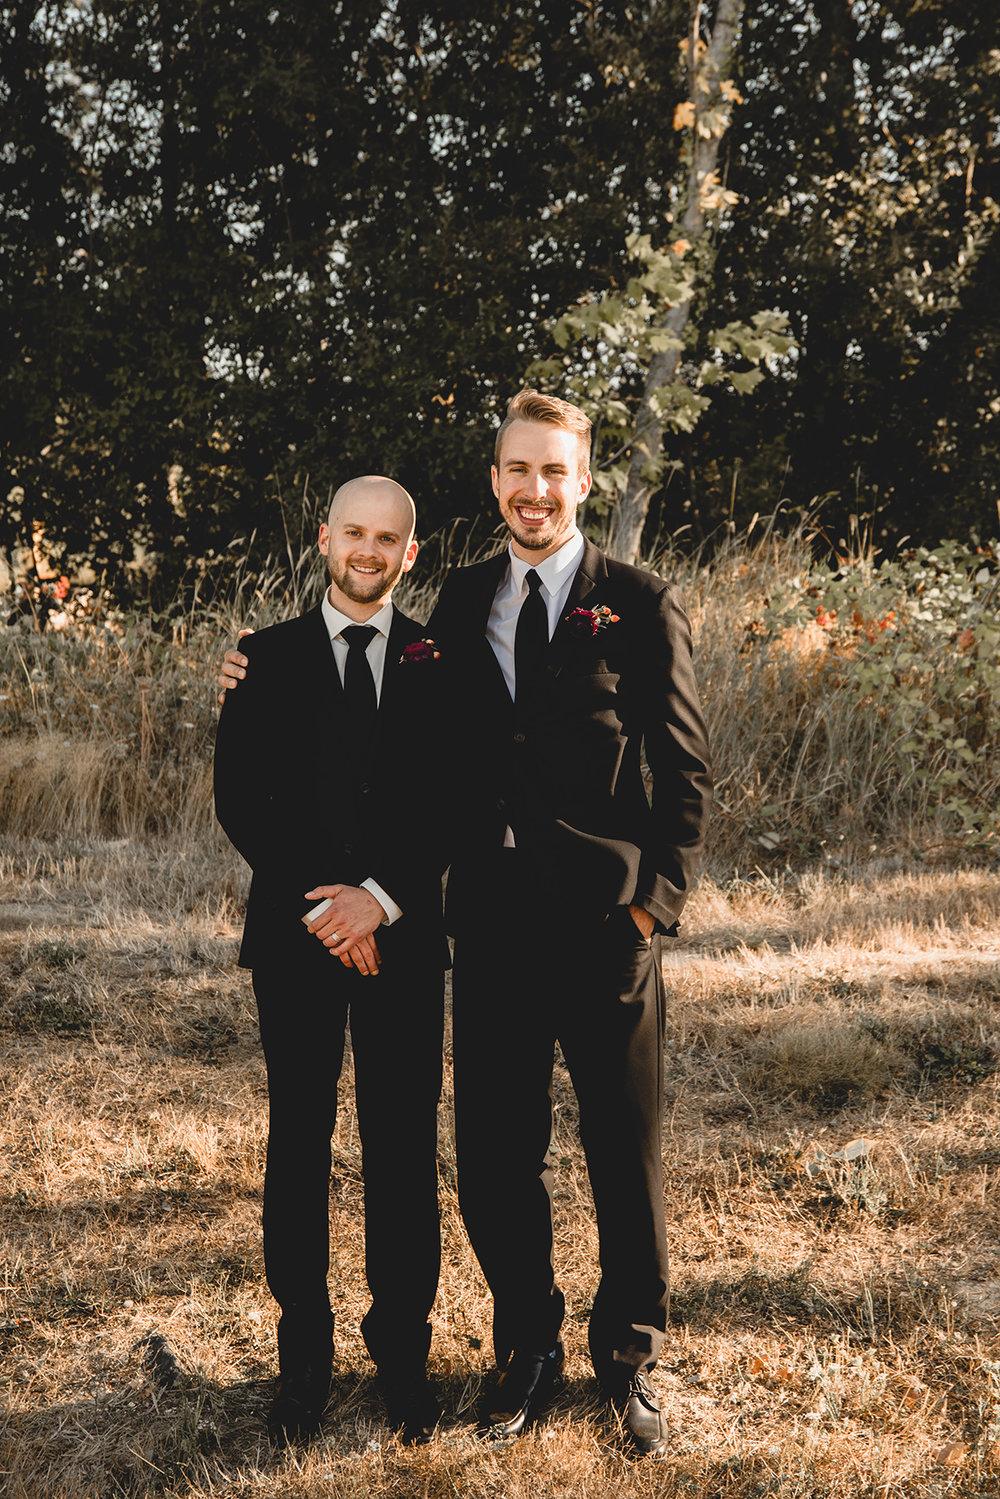 Wedding Photography Vancouver Island BC